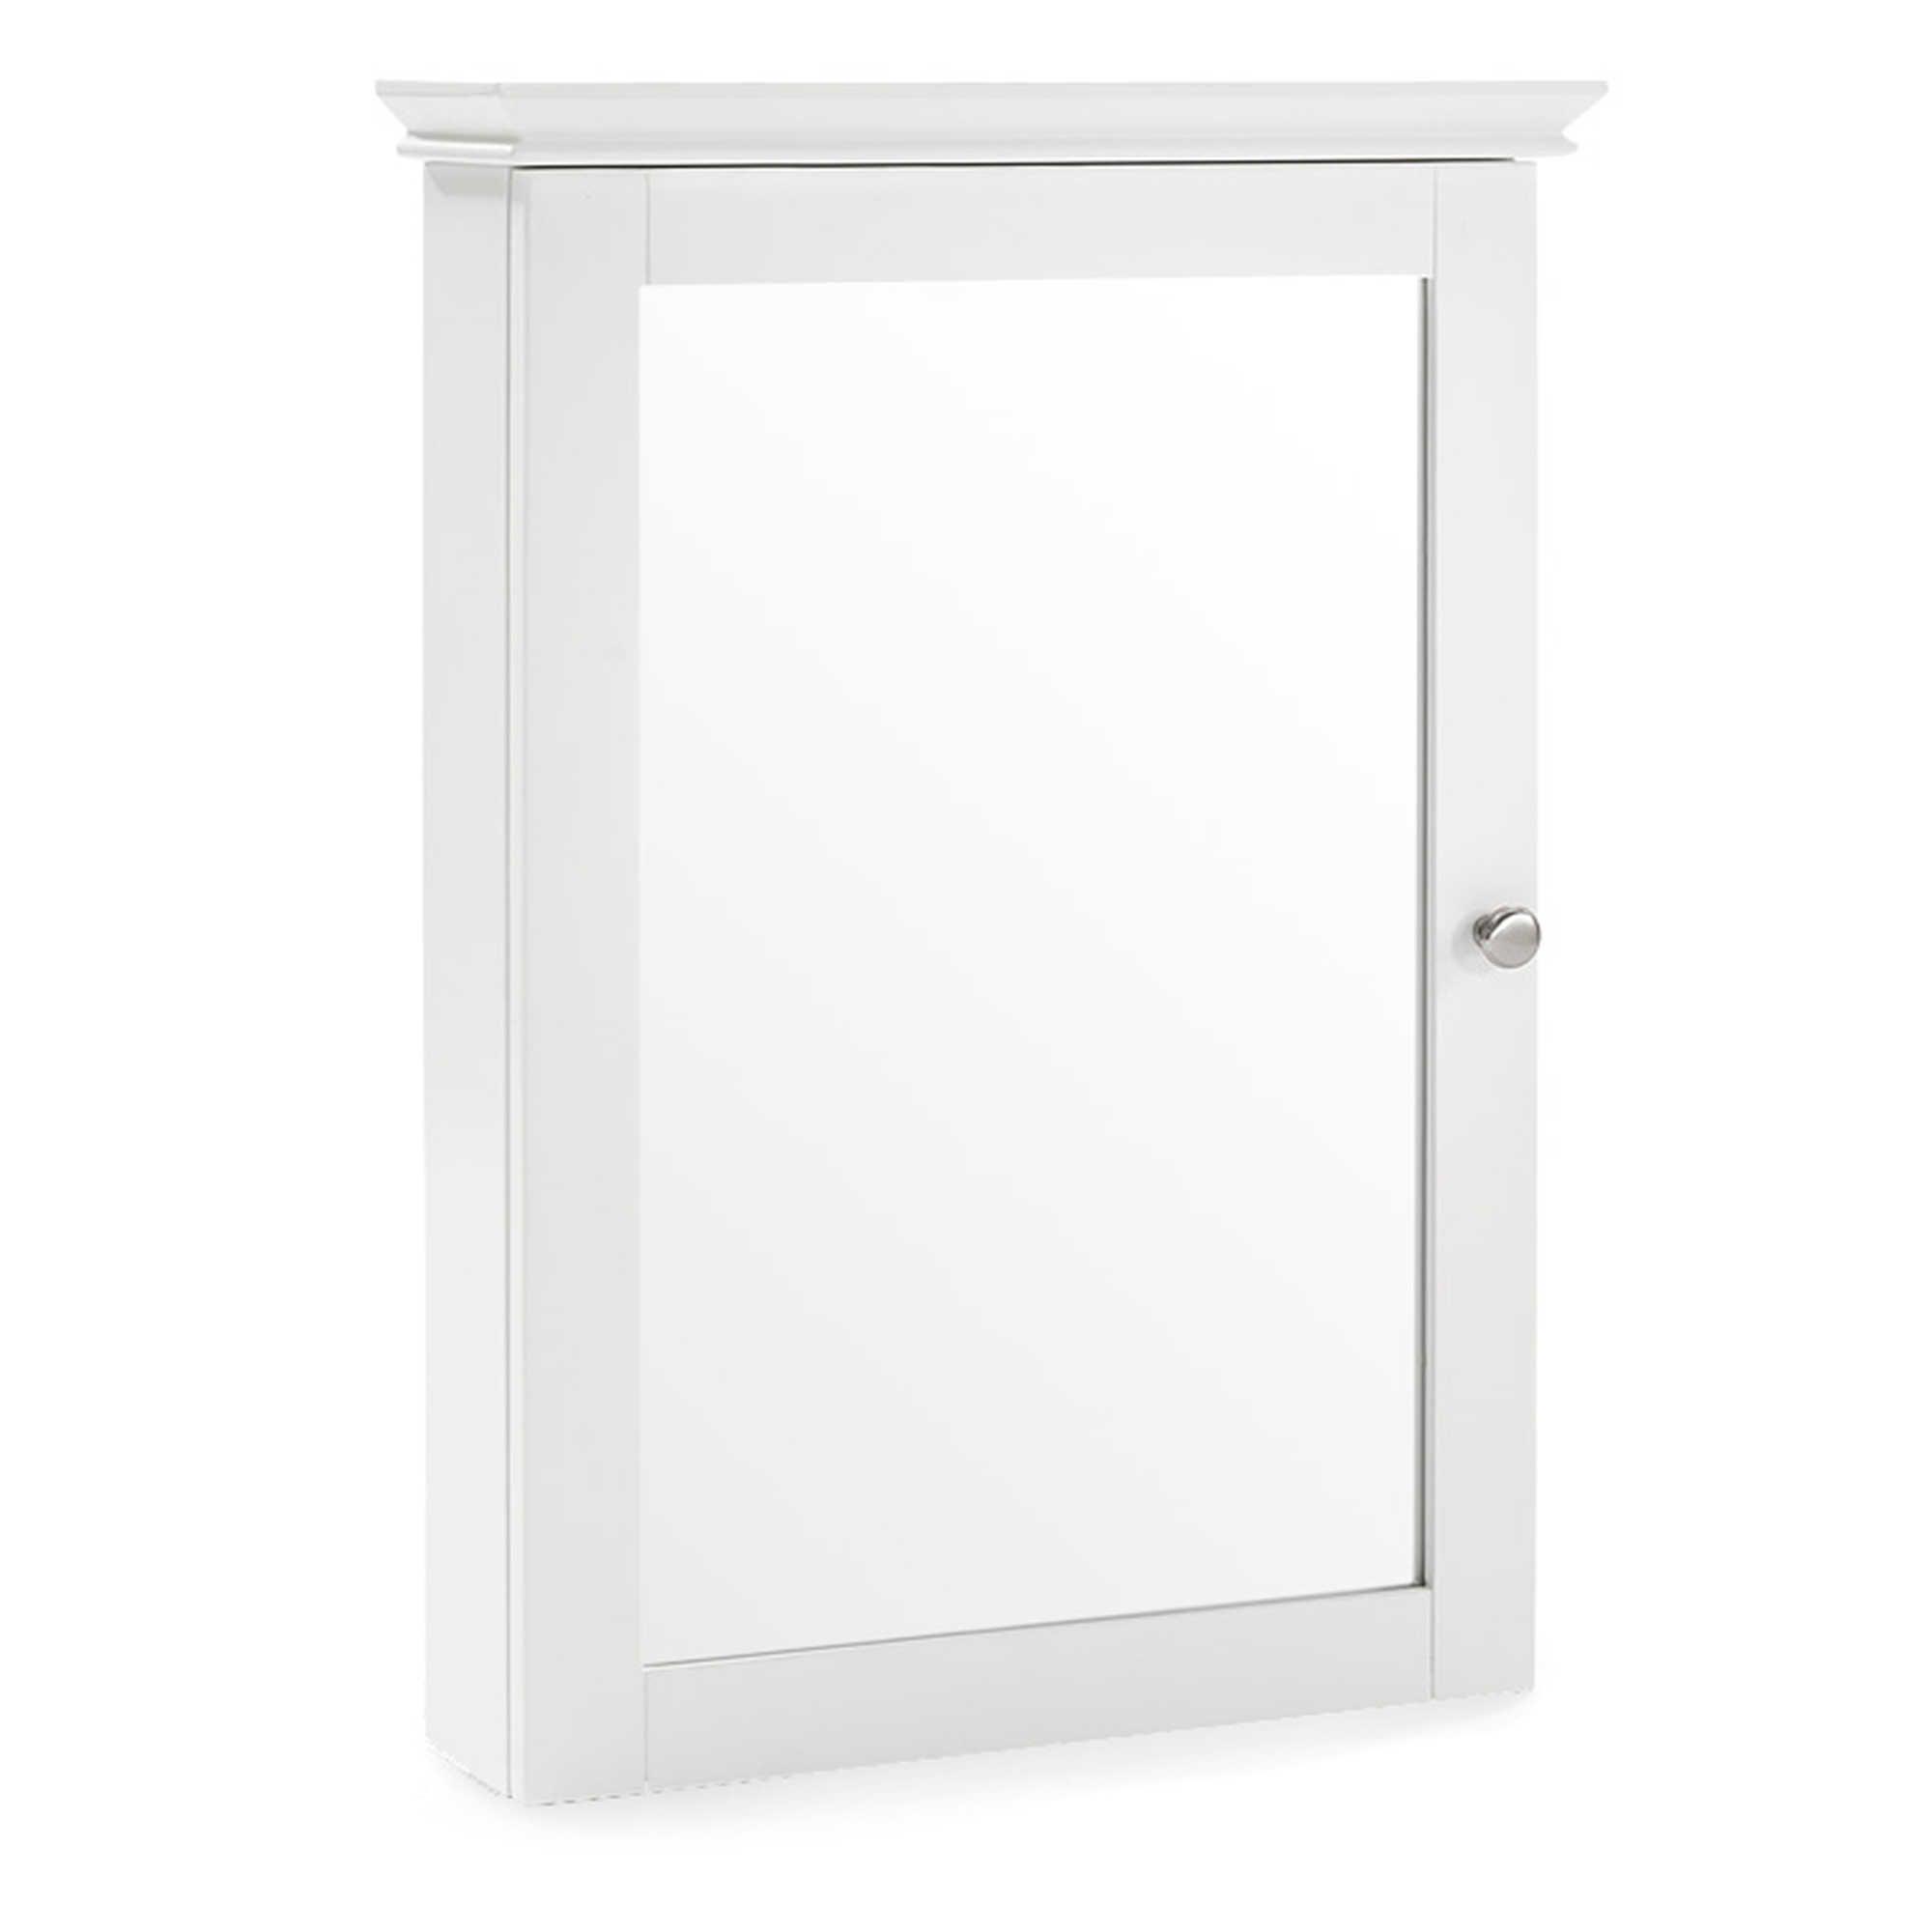 Crosley Lydia Mirrored Wall Cabinet In White Mirror Wall Bathroom Wall Mounted Medicine Cabinet Mirror Wall